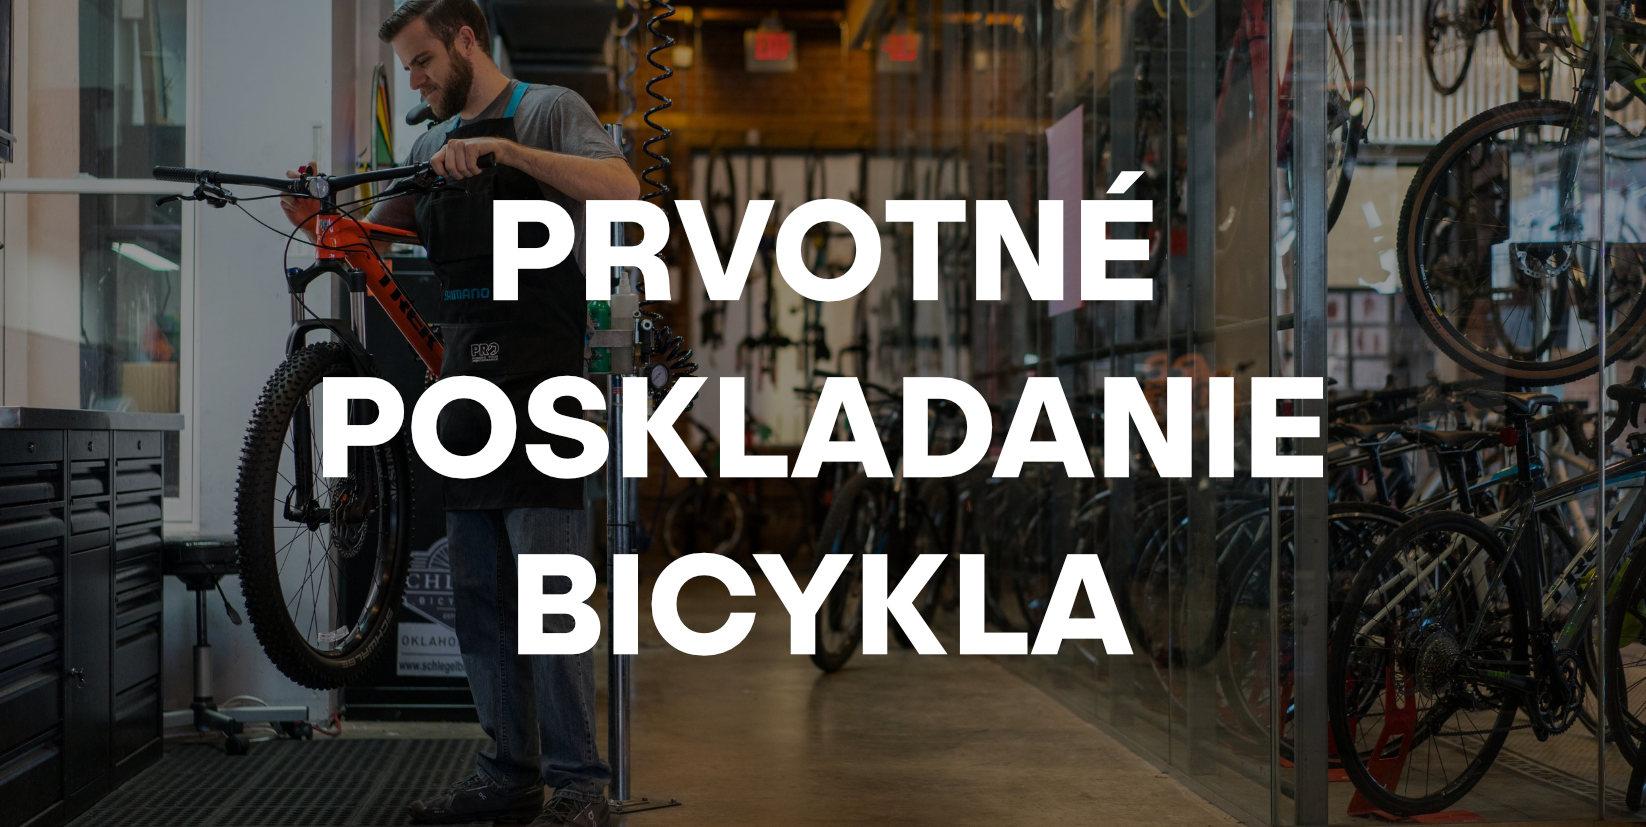 Prvotné poskladanie bicykla